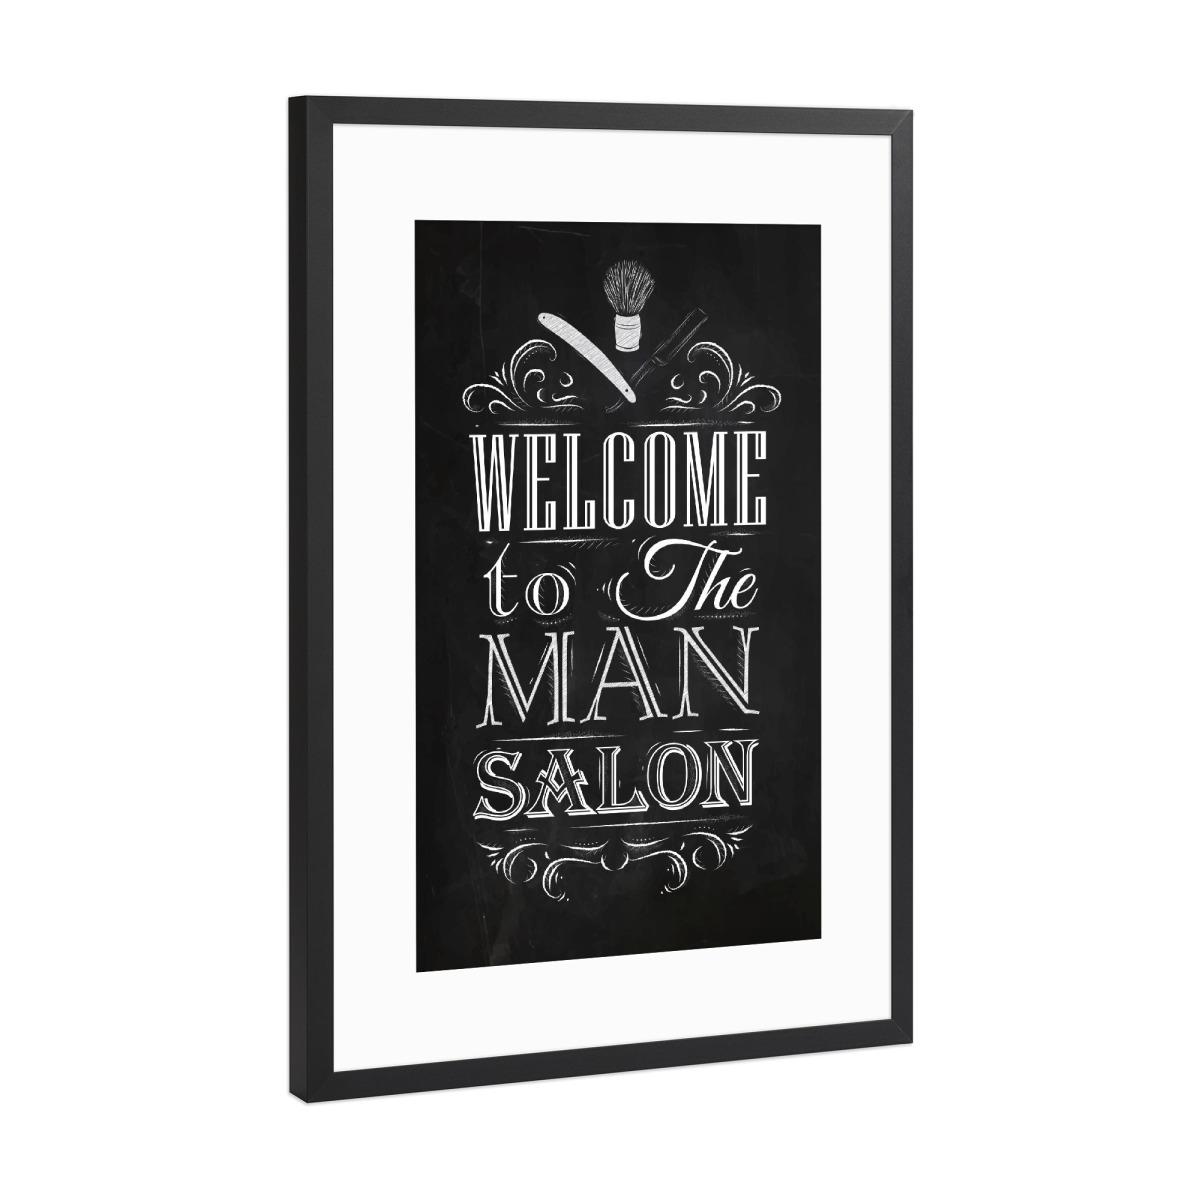 Barber Shop II als Gerahmt bei artboxONE kaufen